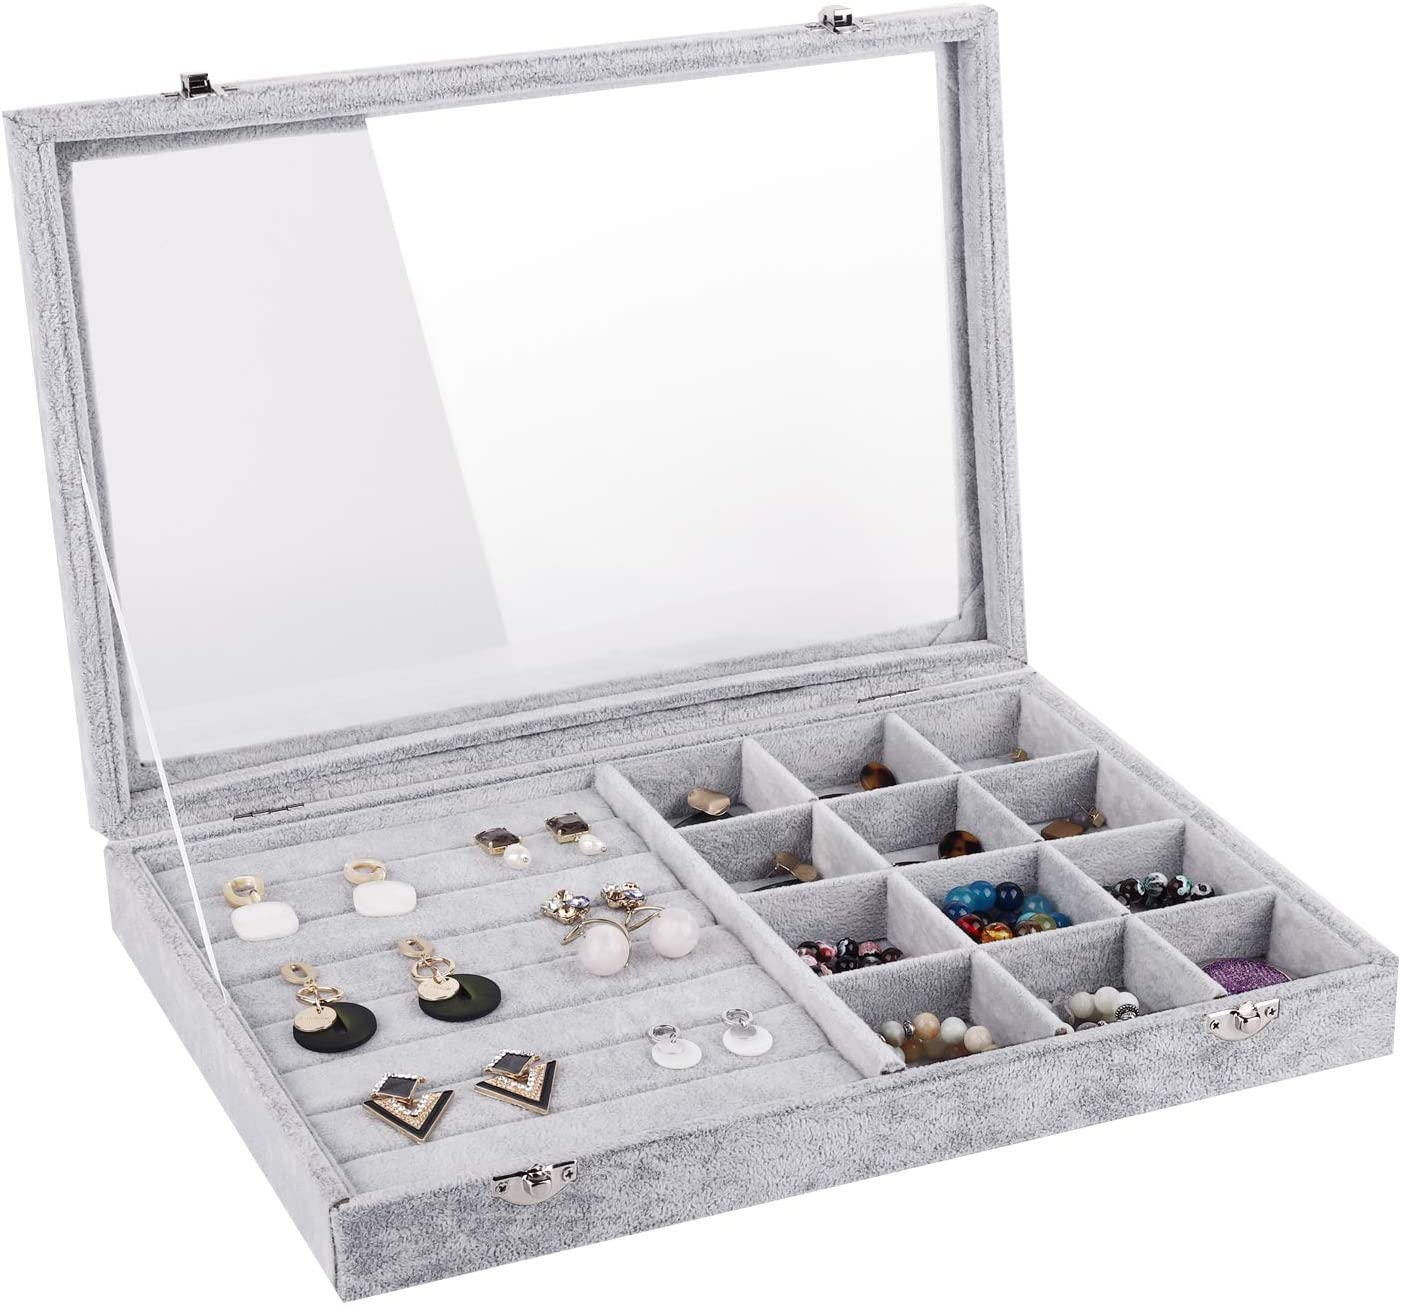 Necklace Jewelry Display Tray Glass Top Lockable Bracelet Storage Organzier Case